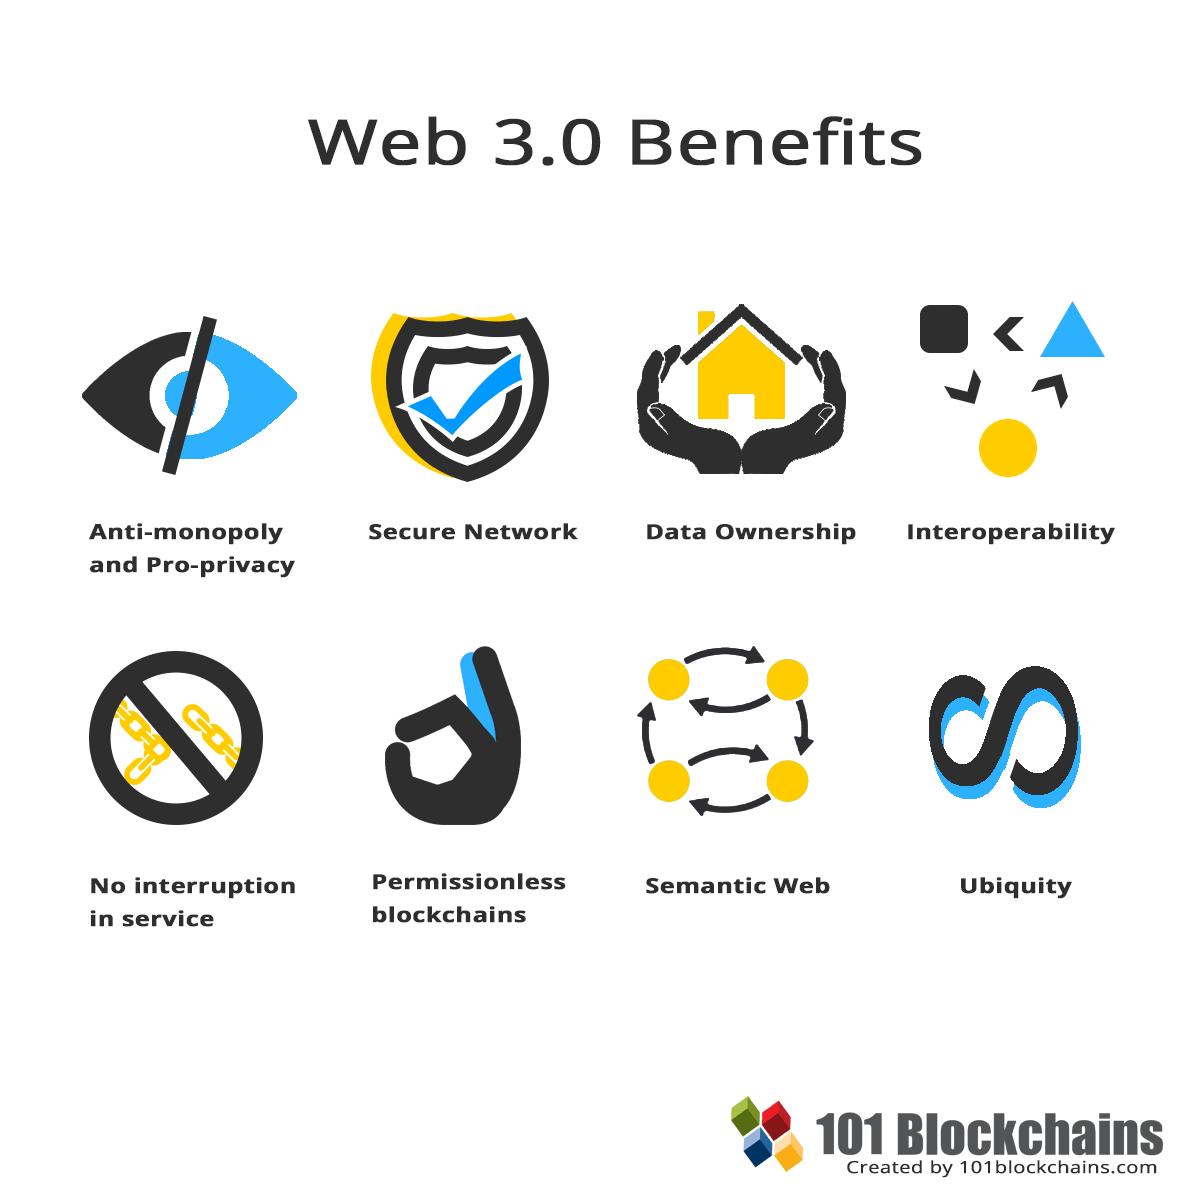 Web 3.0 Benifits